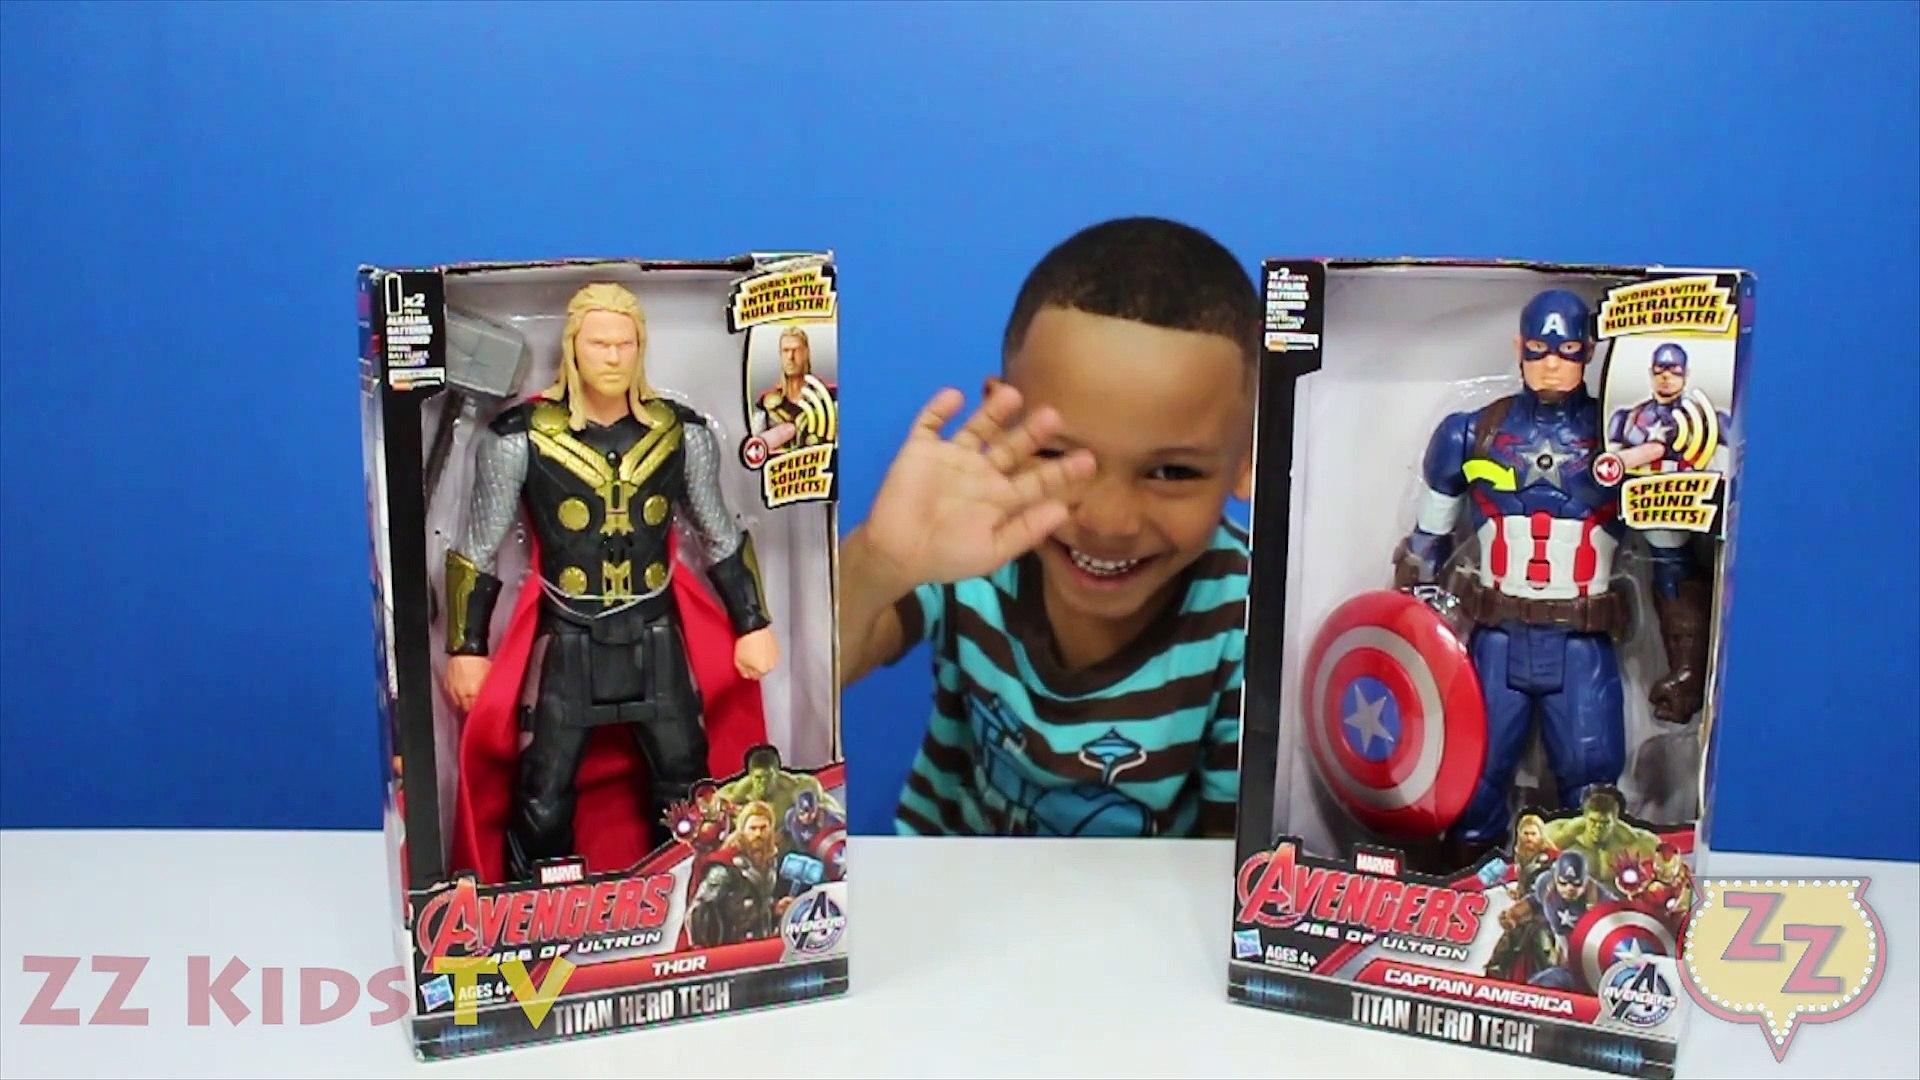 Surprise Toys: THOR vs CAPTAIN AMERICA, Avengers Age of Ultron, ZZ Kids TV